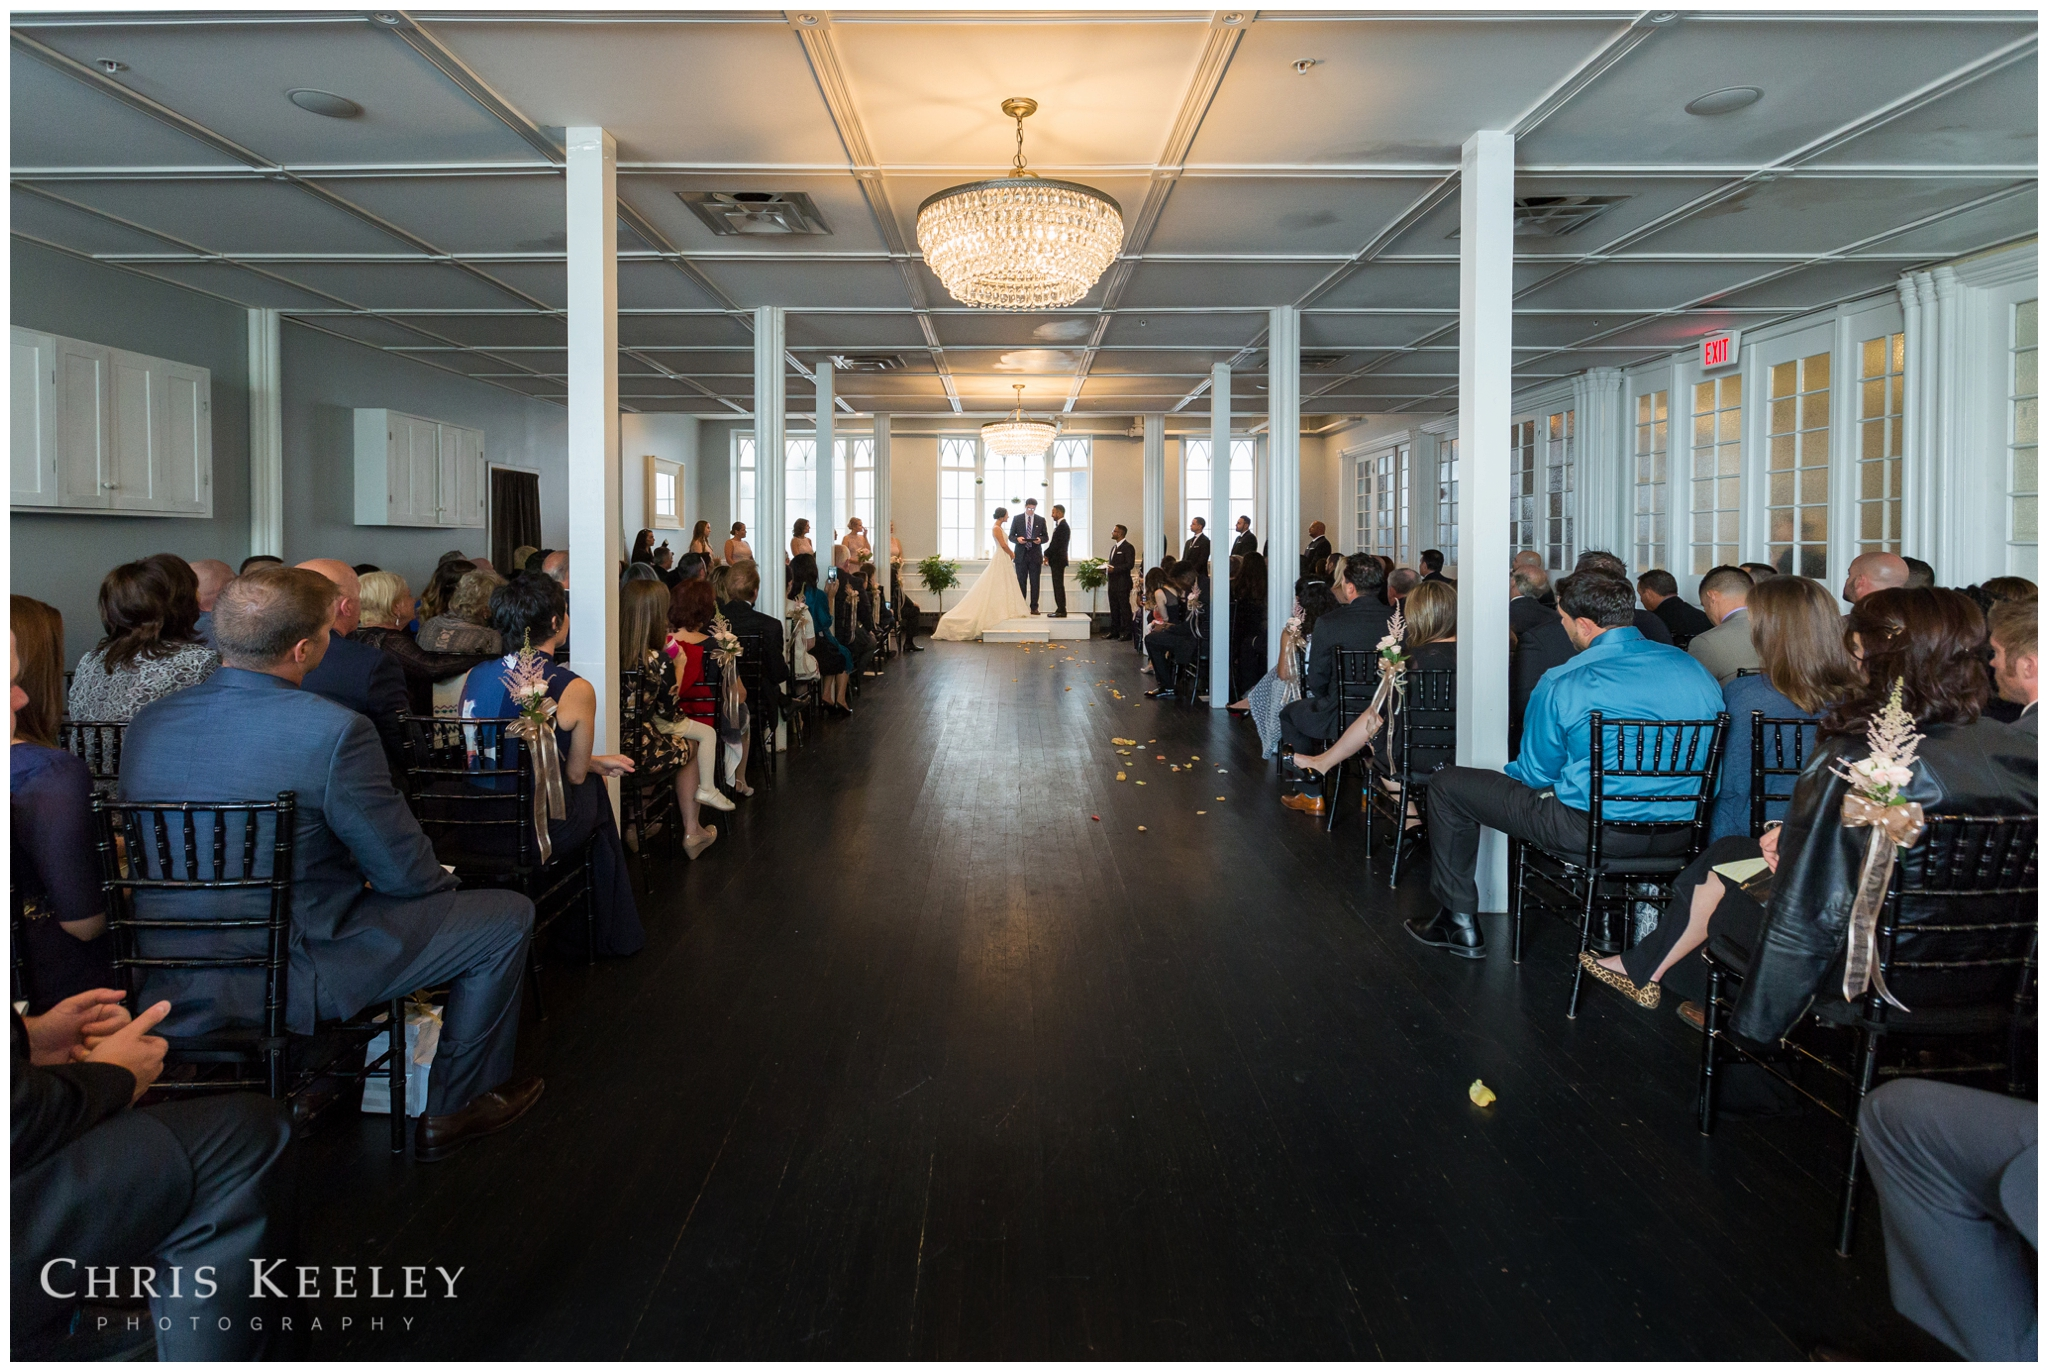 grace-restaurant-portland-maine-wedding-photographer-chris-keeley-40.jpg